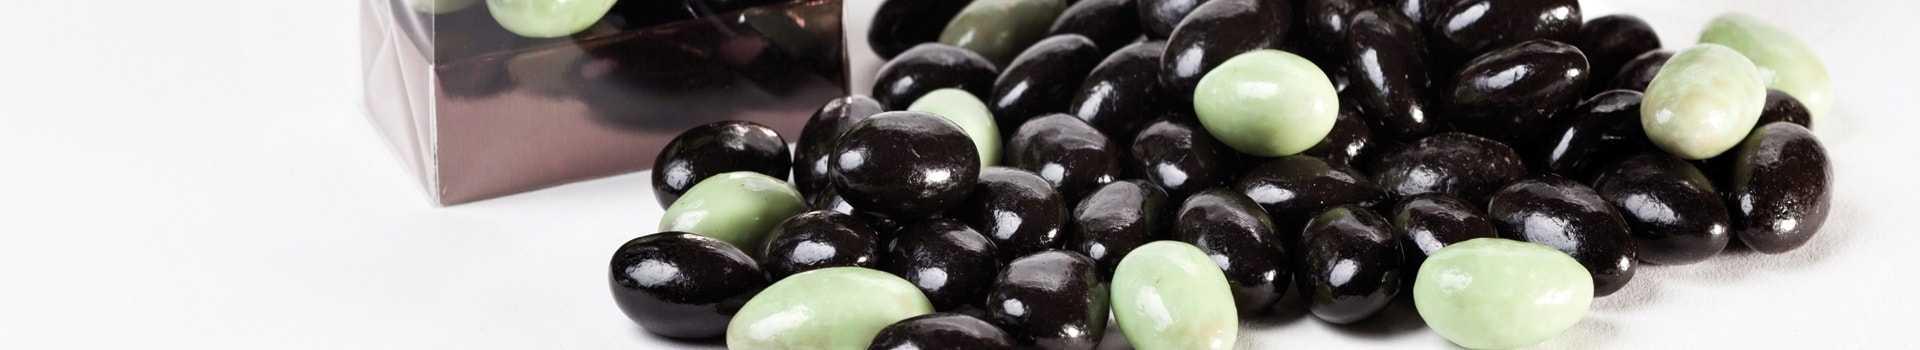 Chocolate-coated